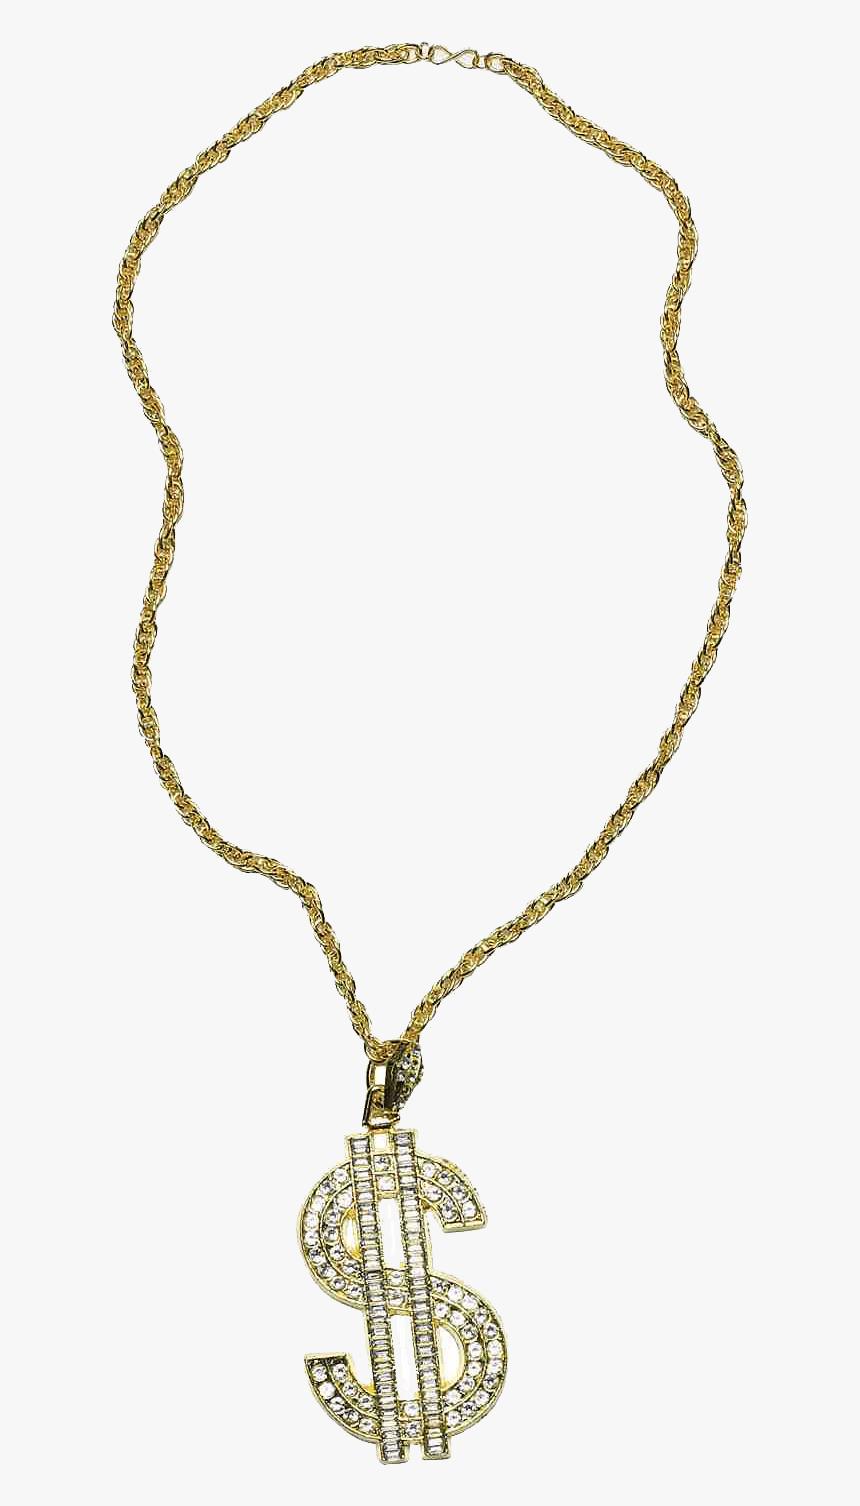 Thug Life Cadena De Oro Con Signo De Dólar - Gold Chains Png Hd, Transparent Png, Free Download